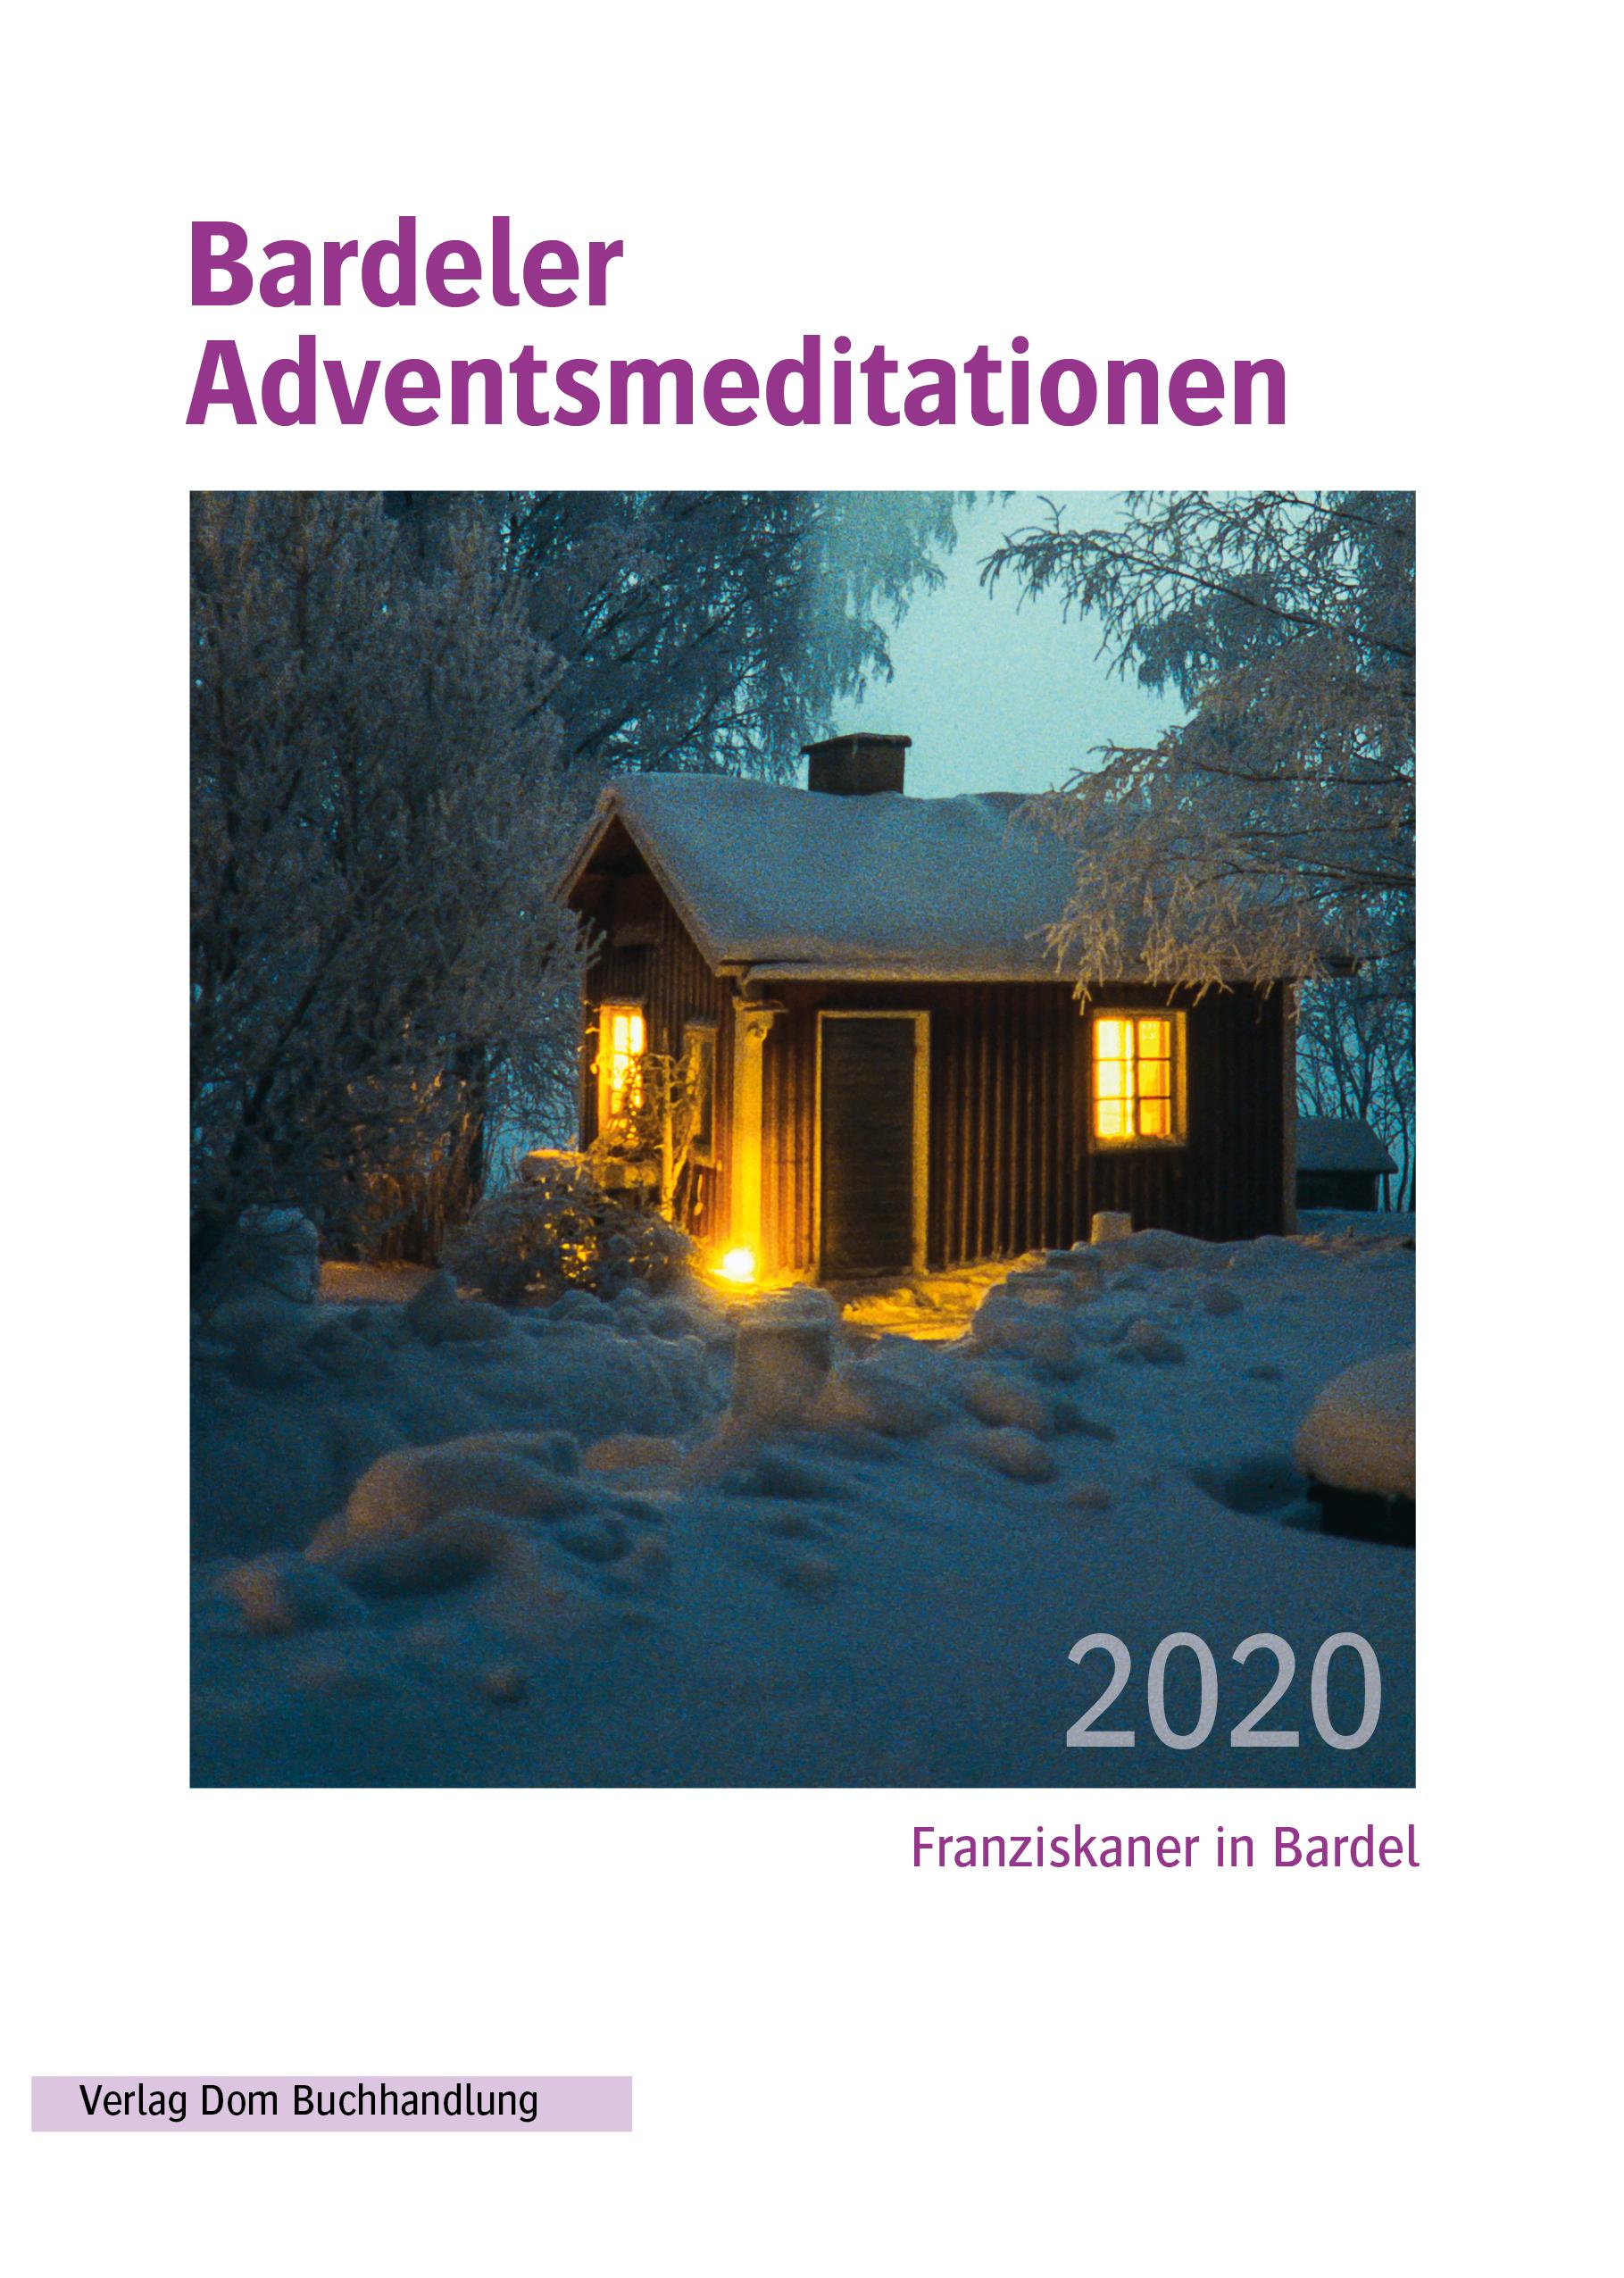 Bardeler Adventsmeditationen 2020